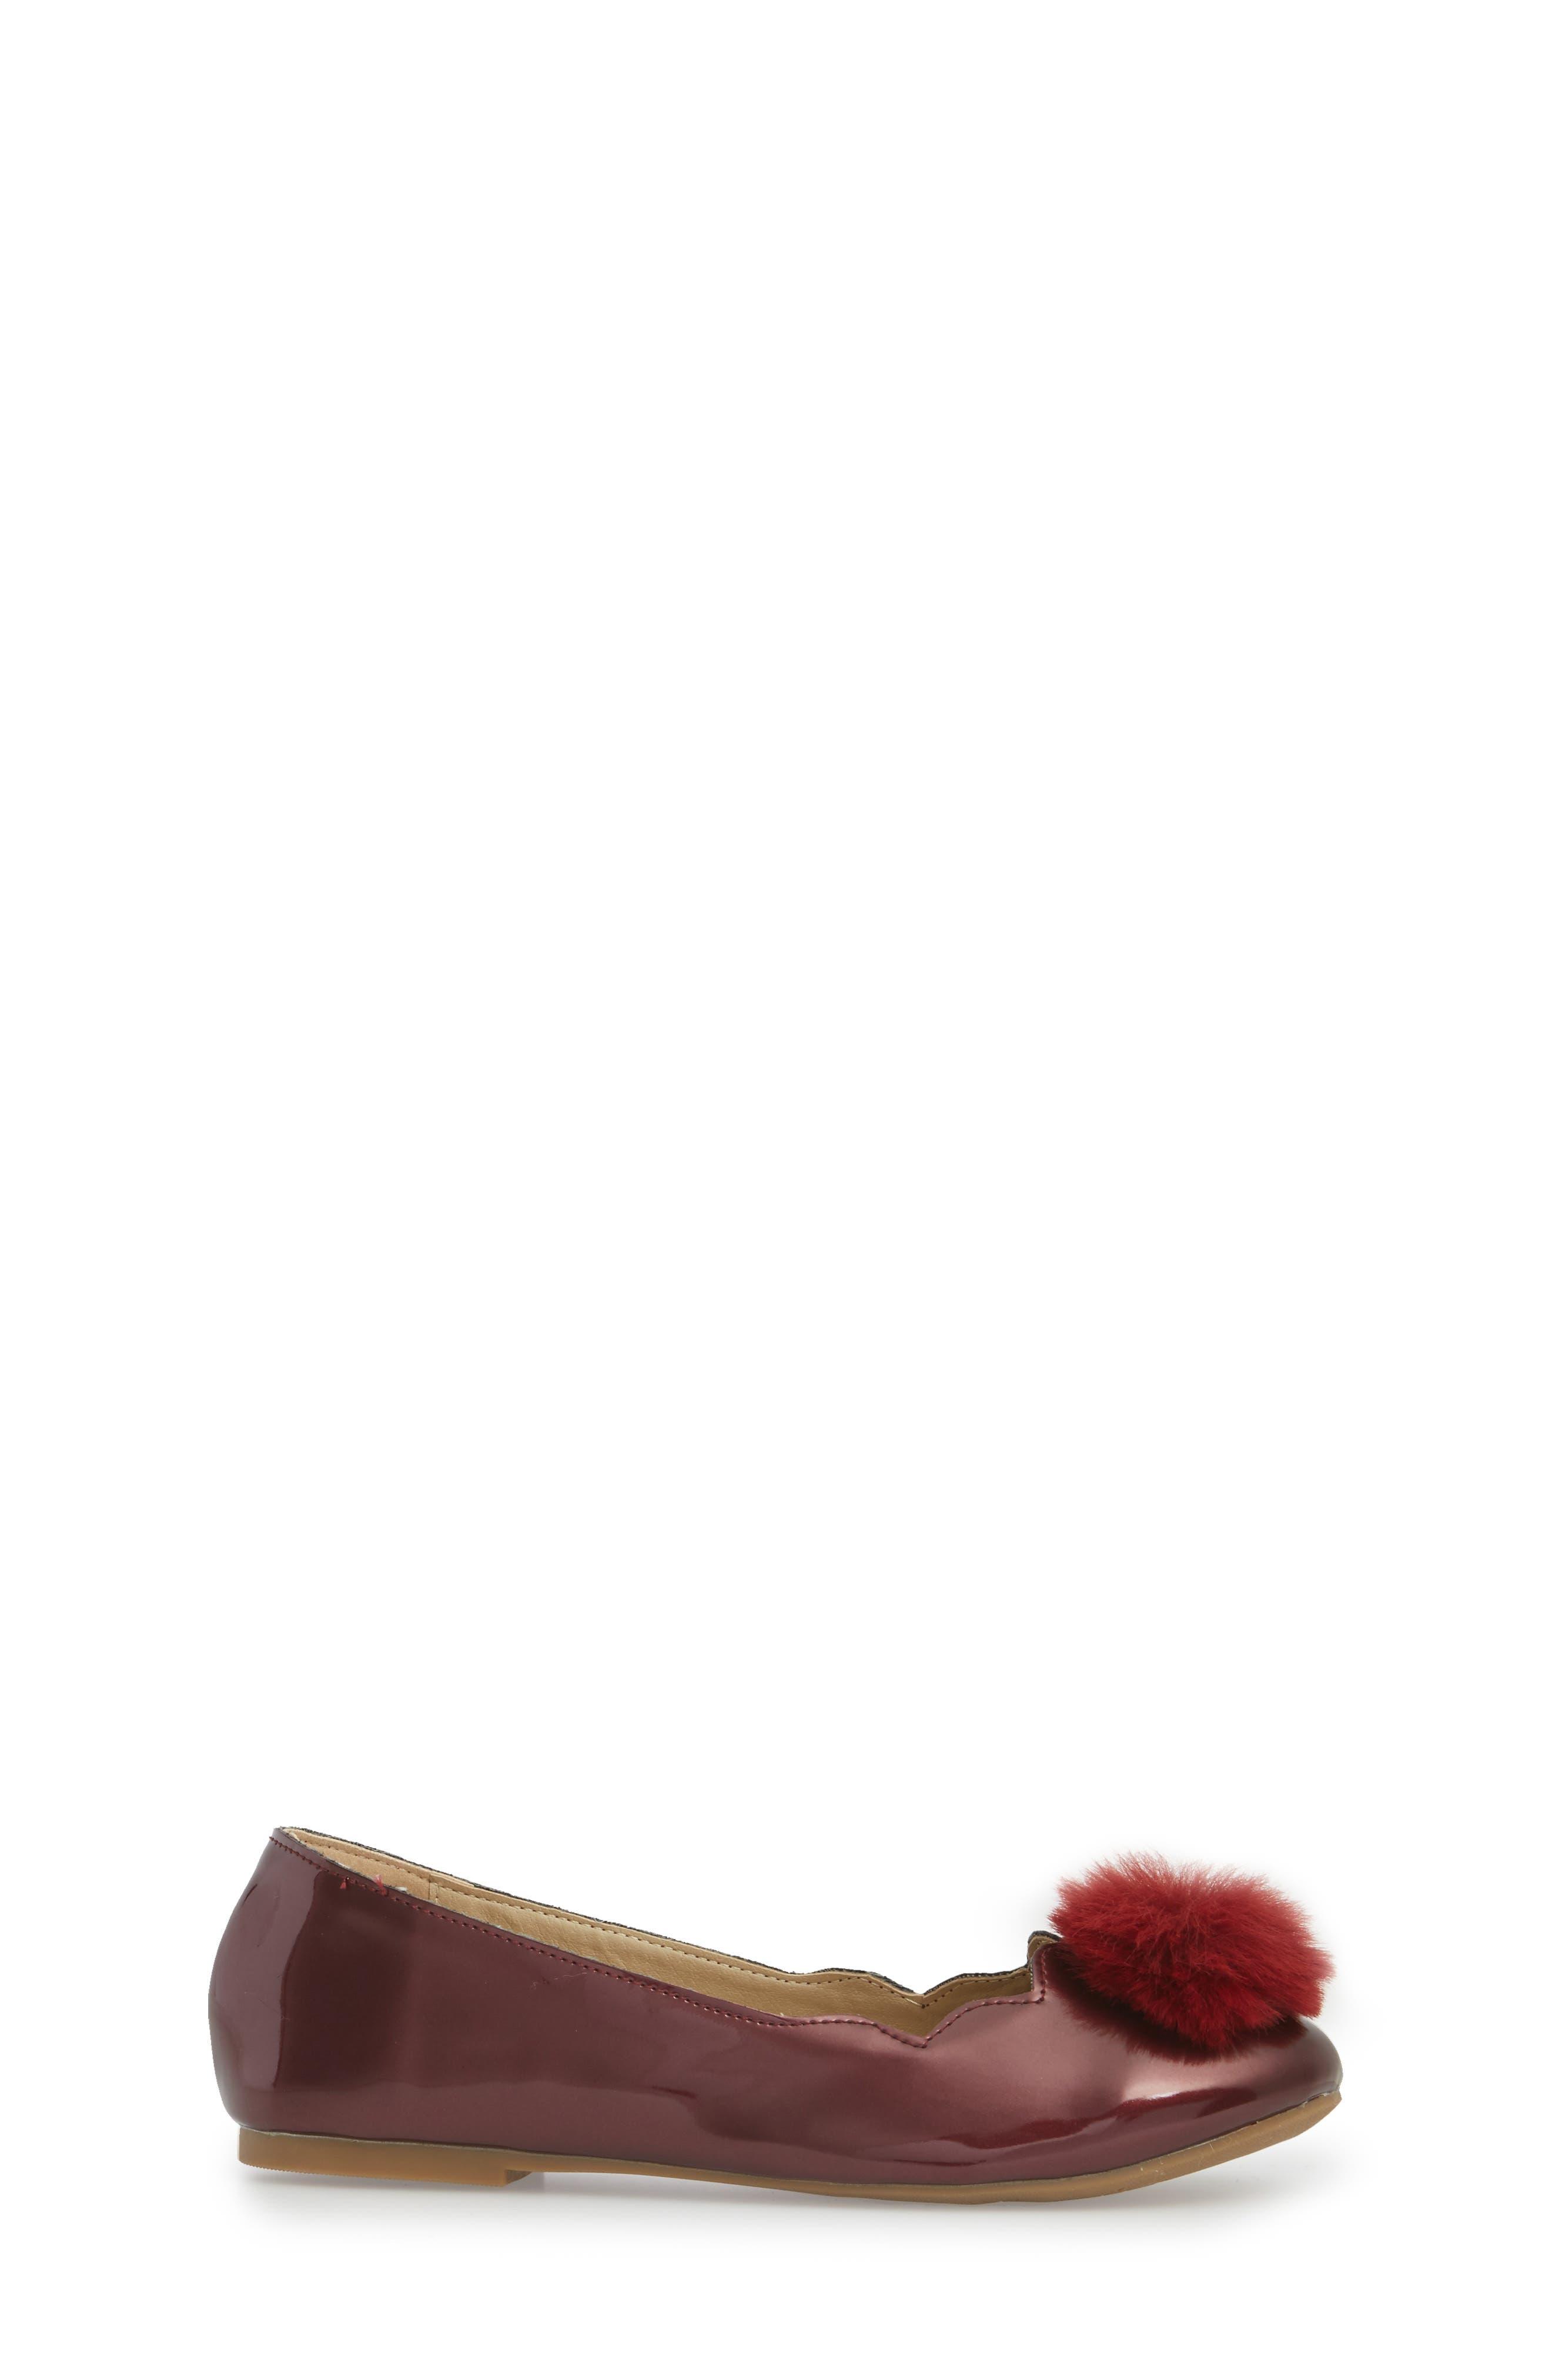 Felicia Anna Faux Fur Pom Flat,                             Alternate thumbnail 3, color,                             Maroon